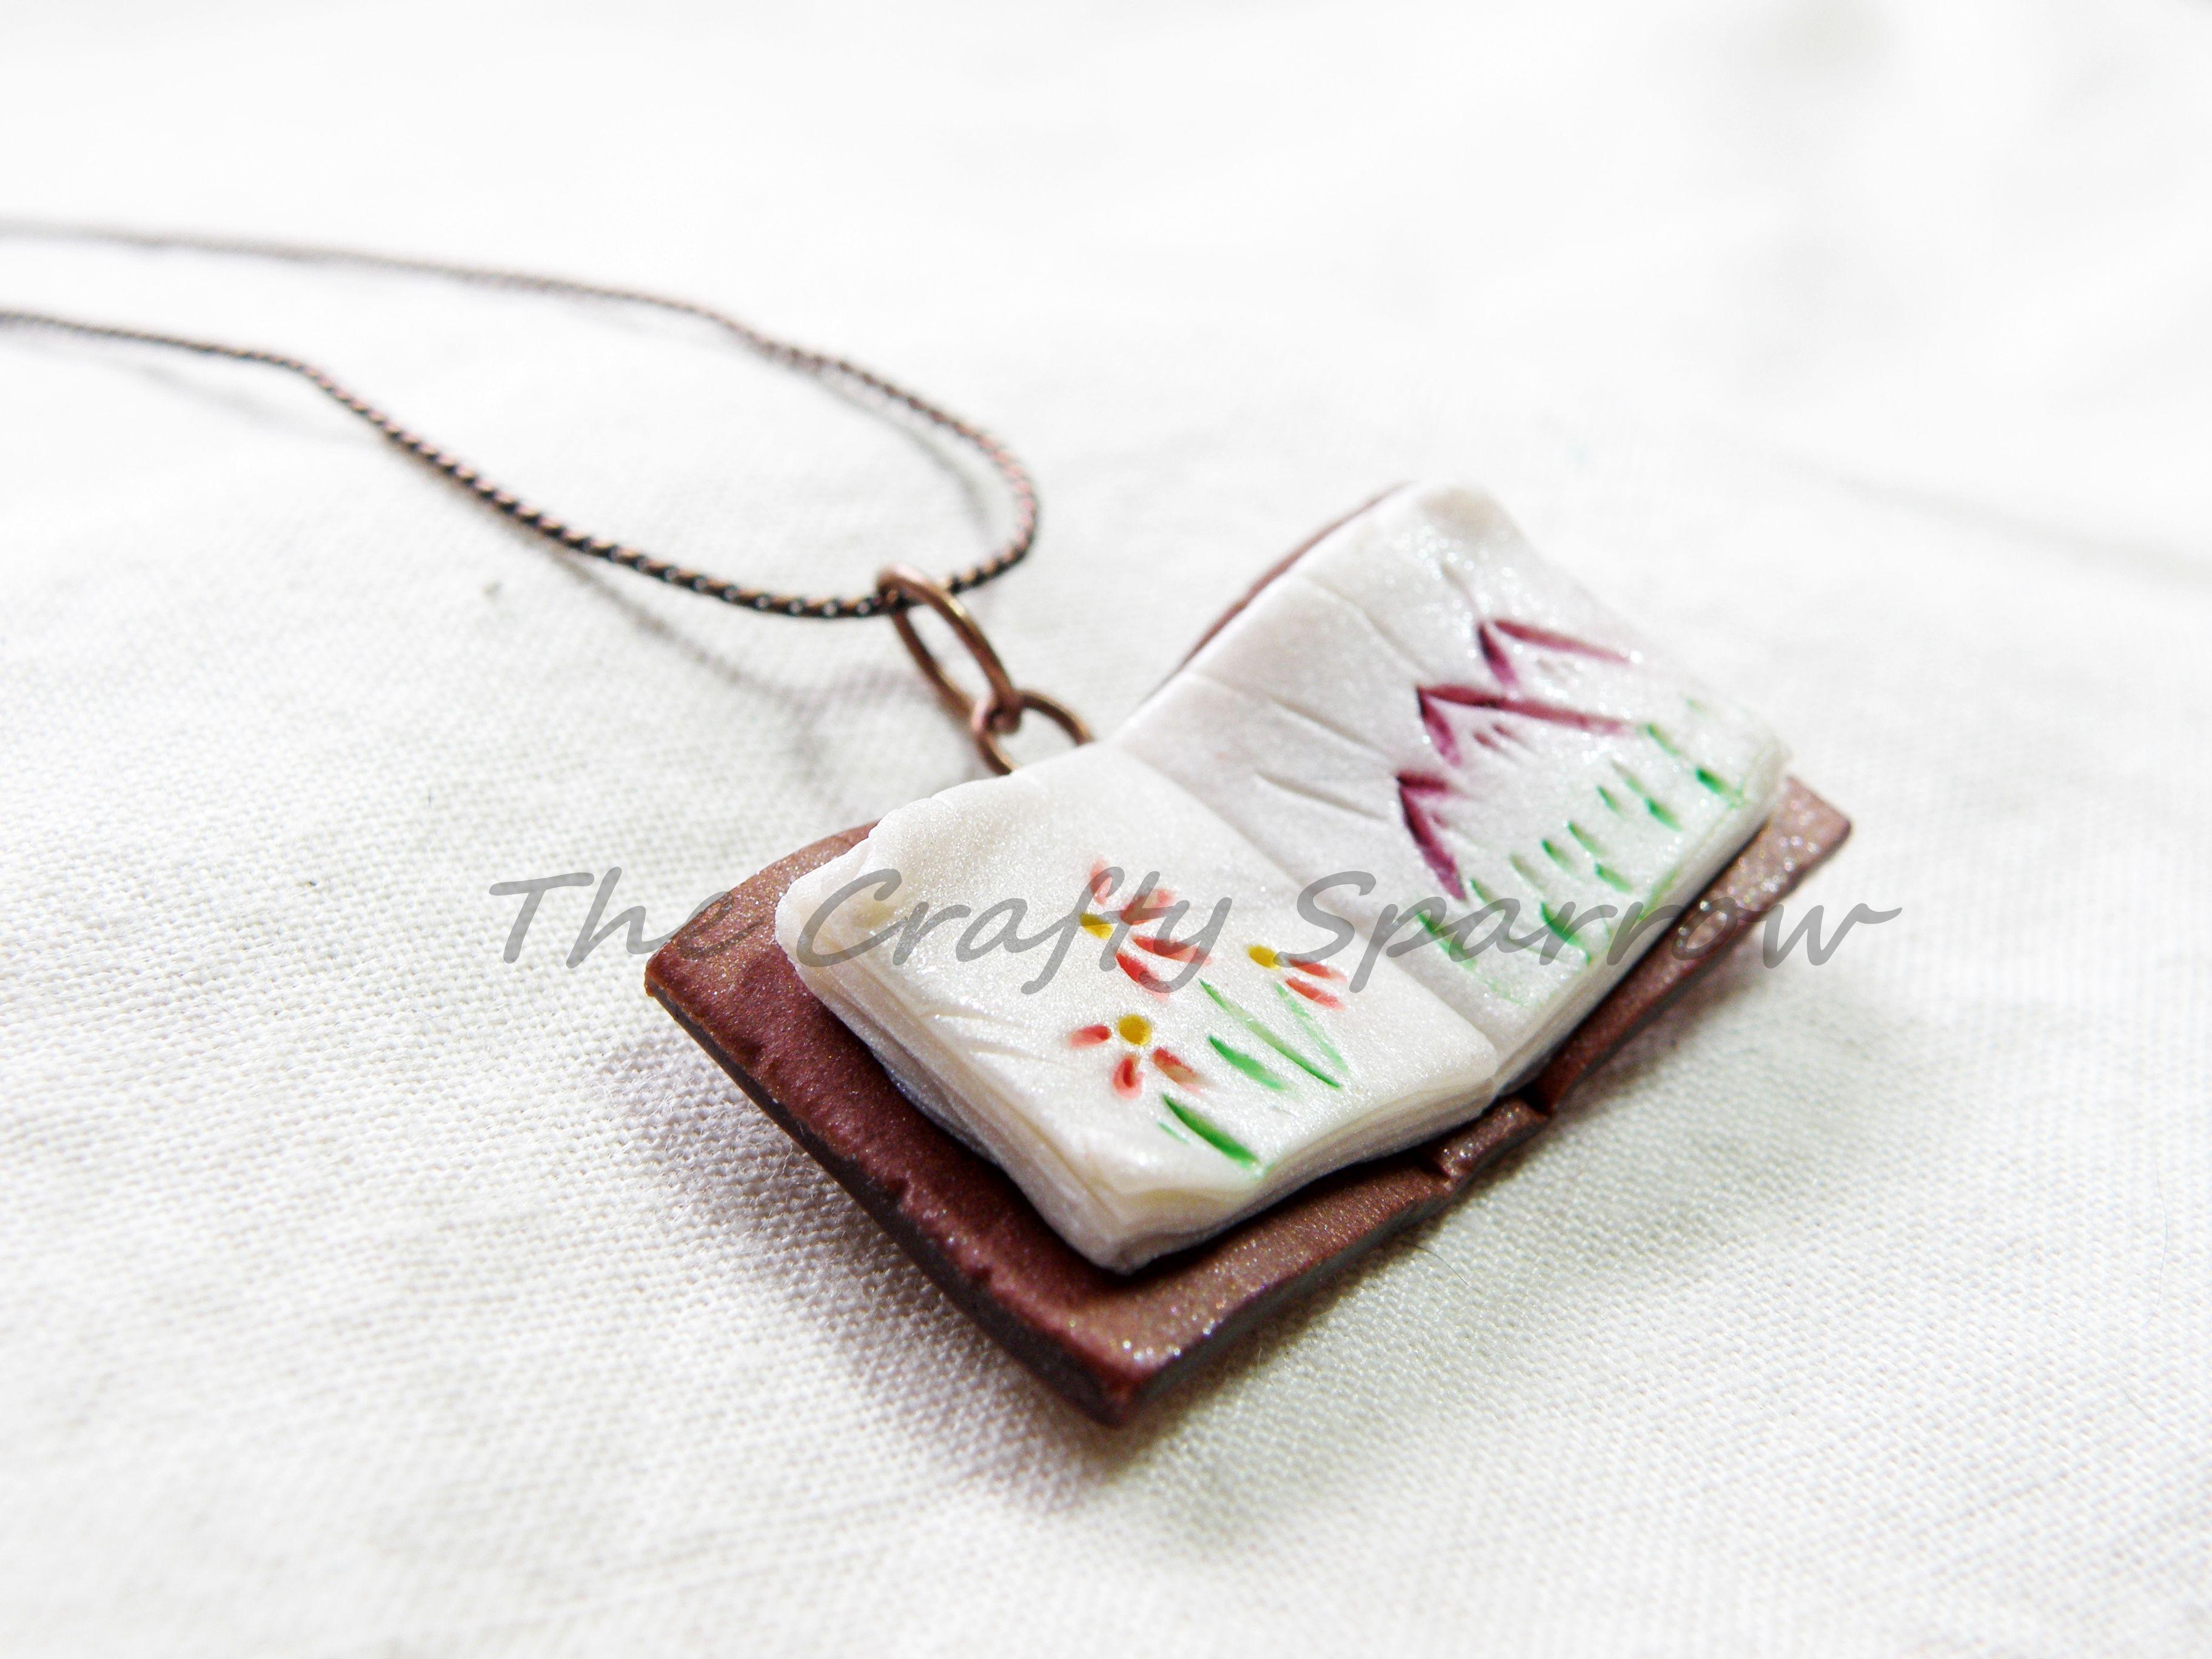 """Artist's Sketchbook"" handmade polymer clay pendant - The Crafty Sparrow"